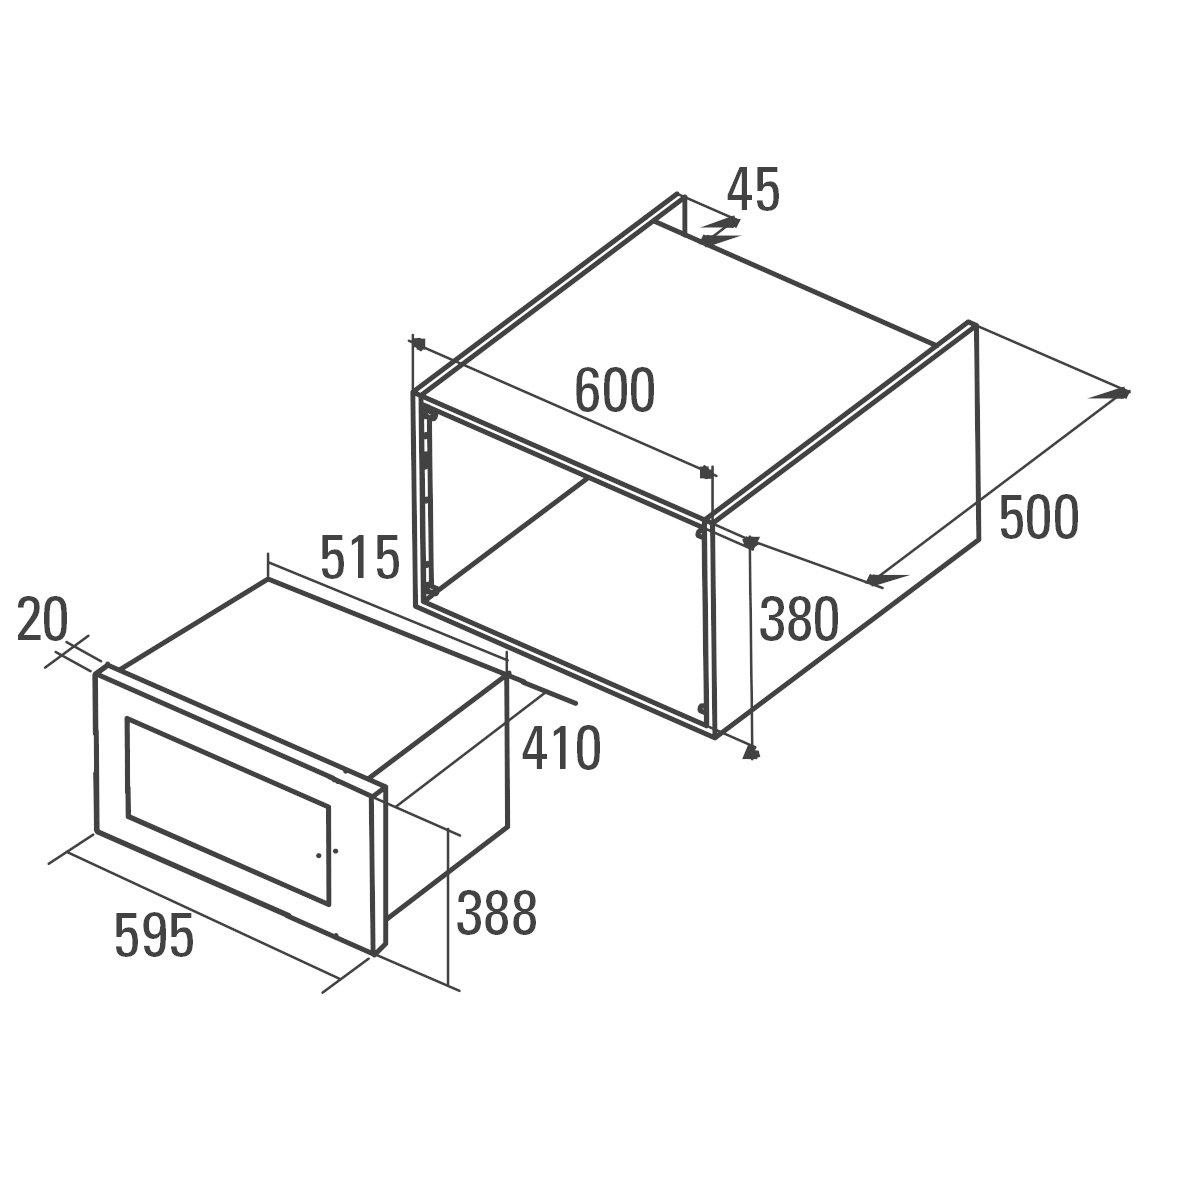 Cata | Microondas Encastrable | Modelo MC 28 D BK | Con capacidad de 28 Litros | Cinco Niveles de Potencia |Microondas con grill simultáneo de Cuarzo ...